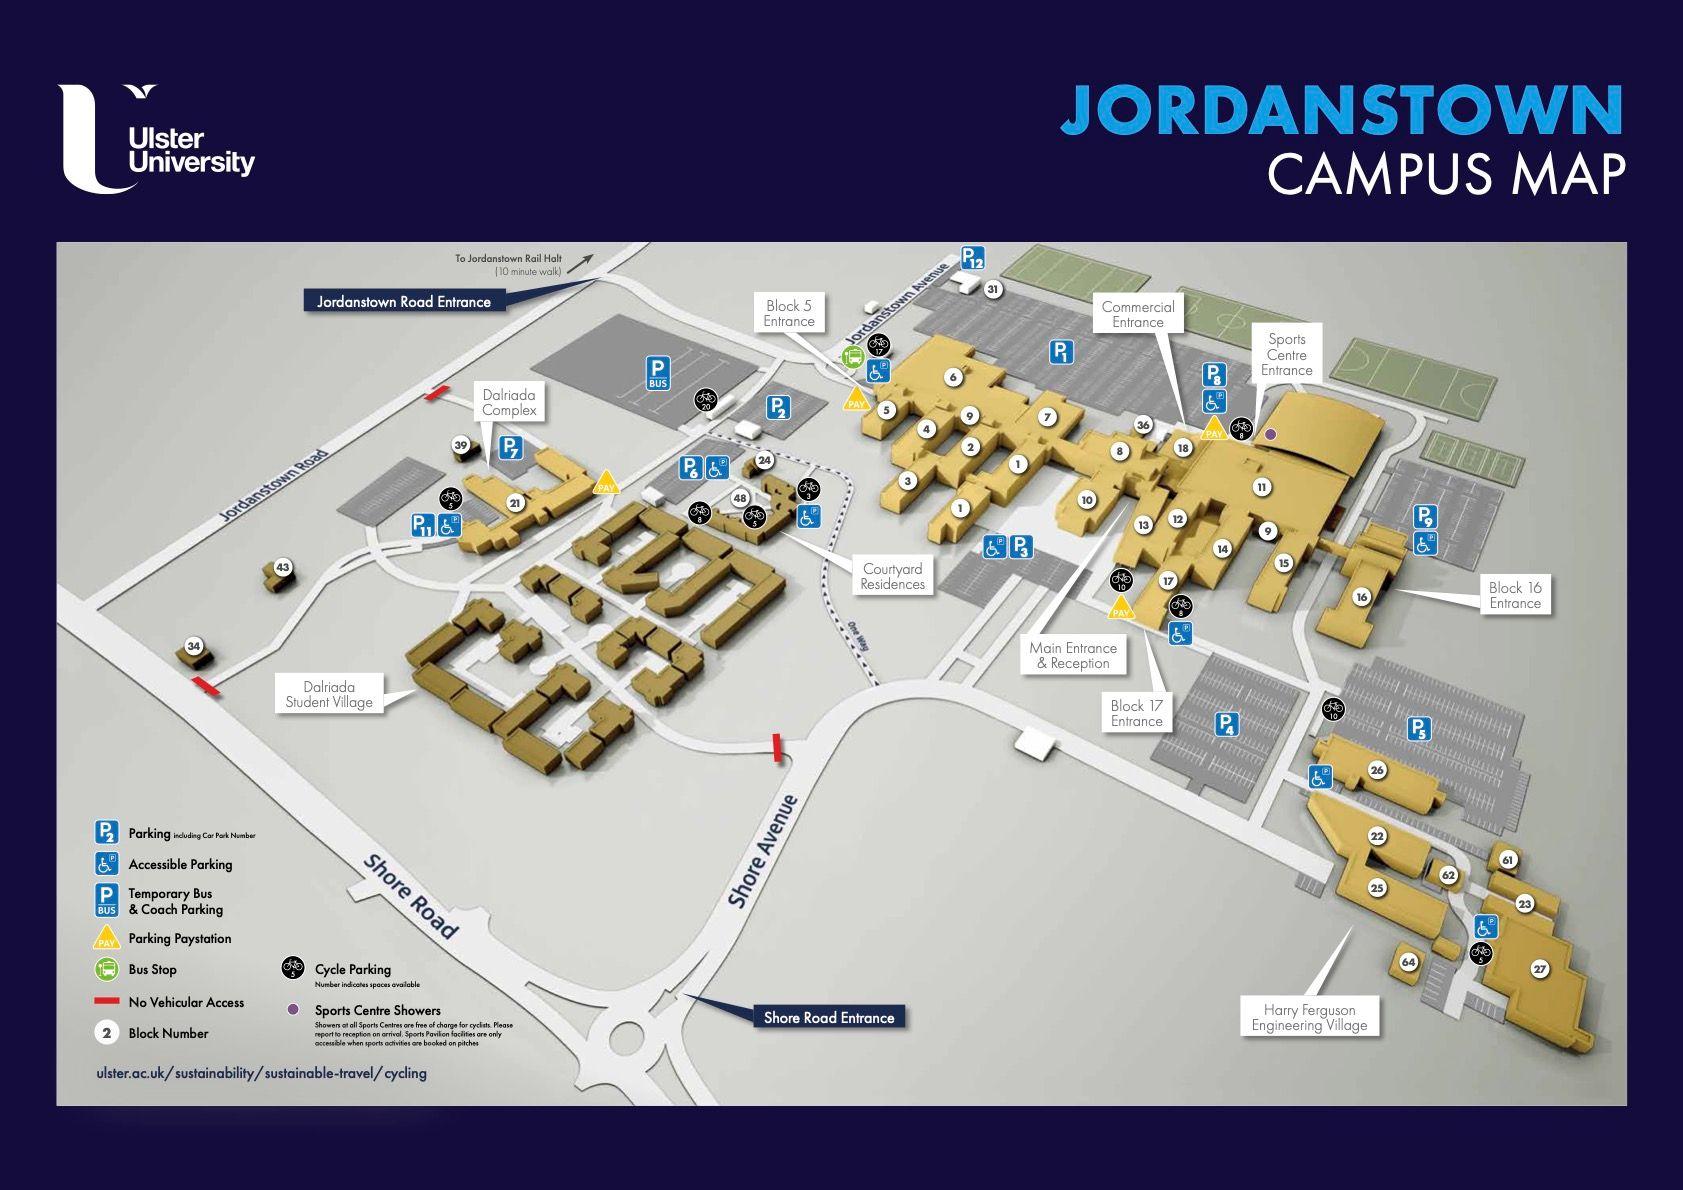 ulster university jordanstown